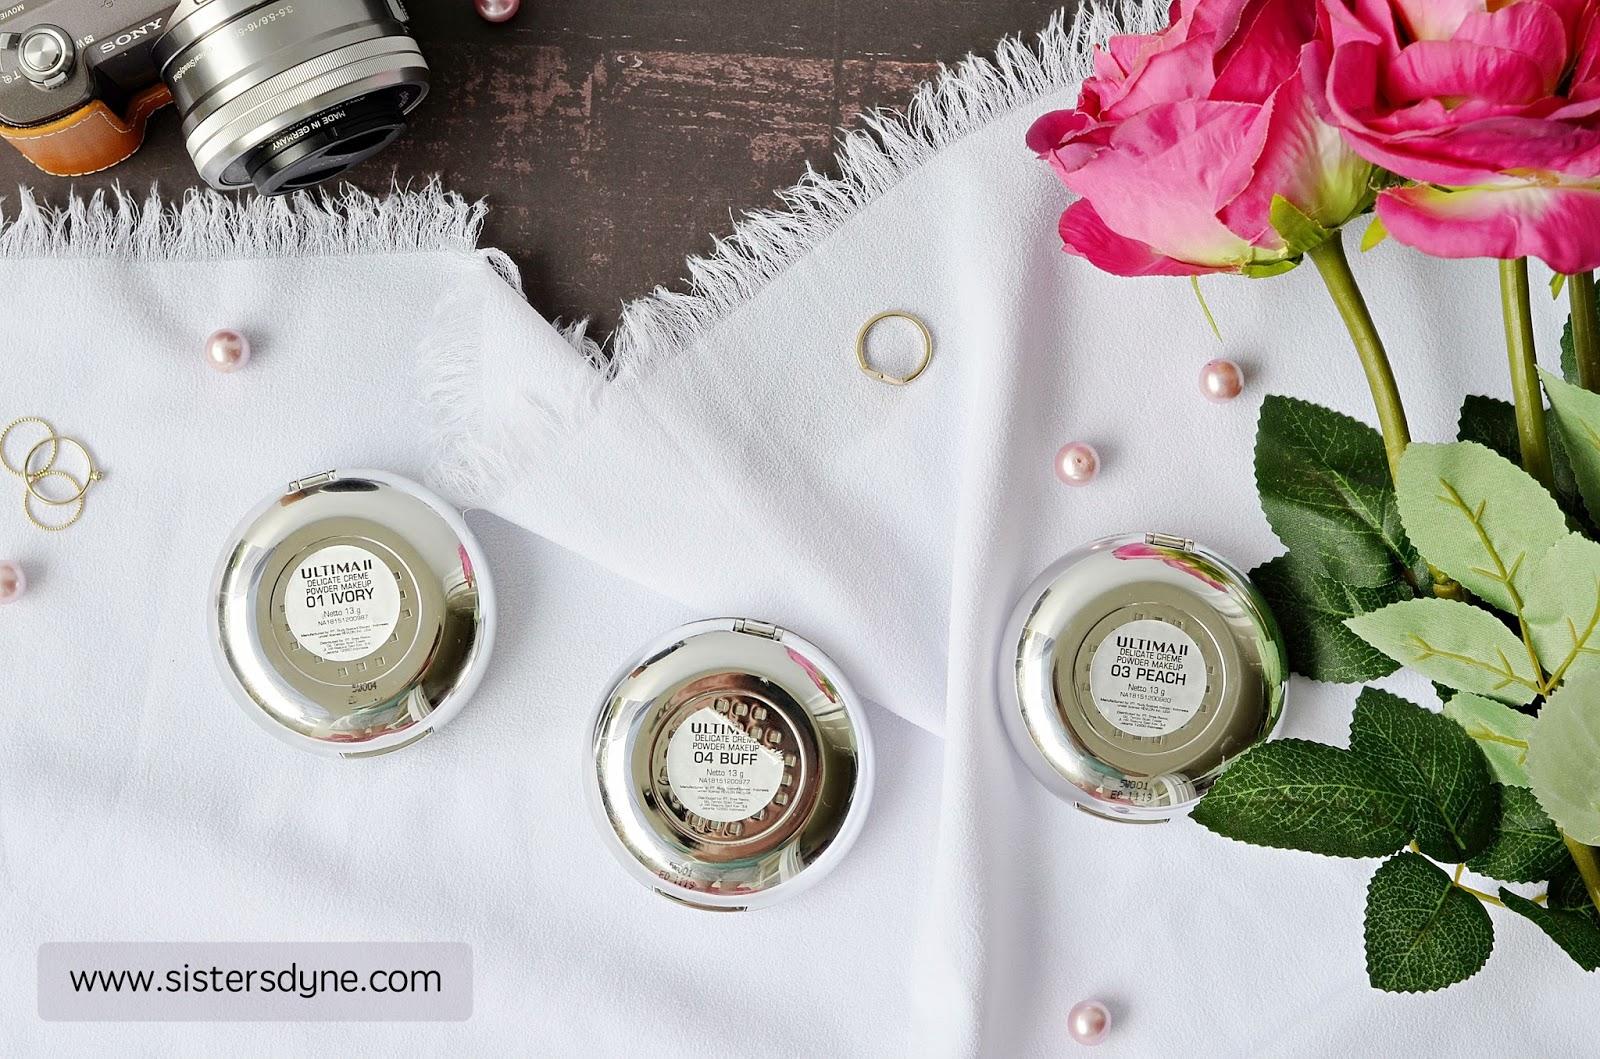 Ultima Ii Delicate Creme Makeup Ocher Daftar Harga Terbaru Translucent Face Powder 24g And